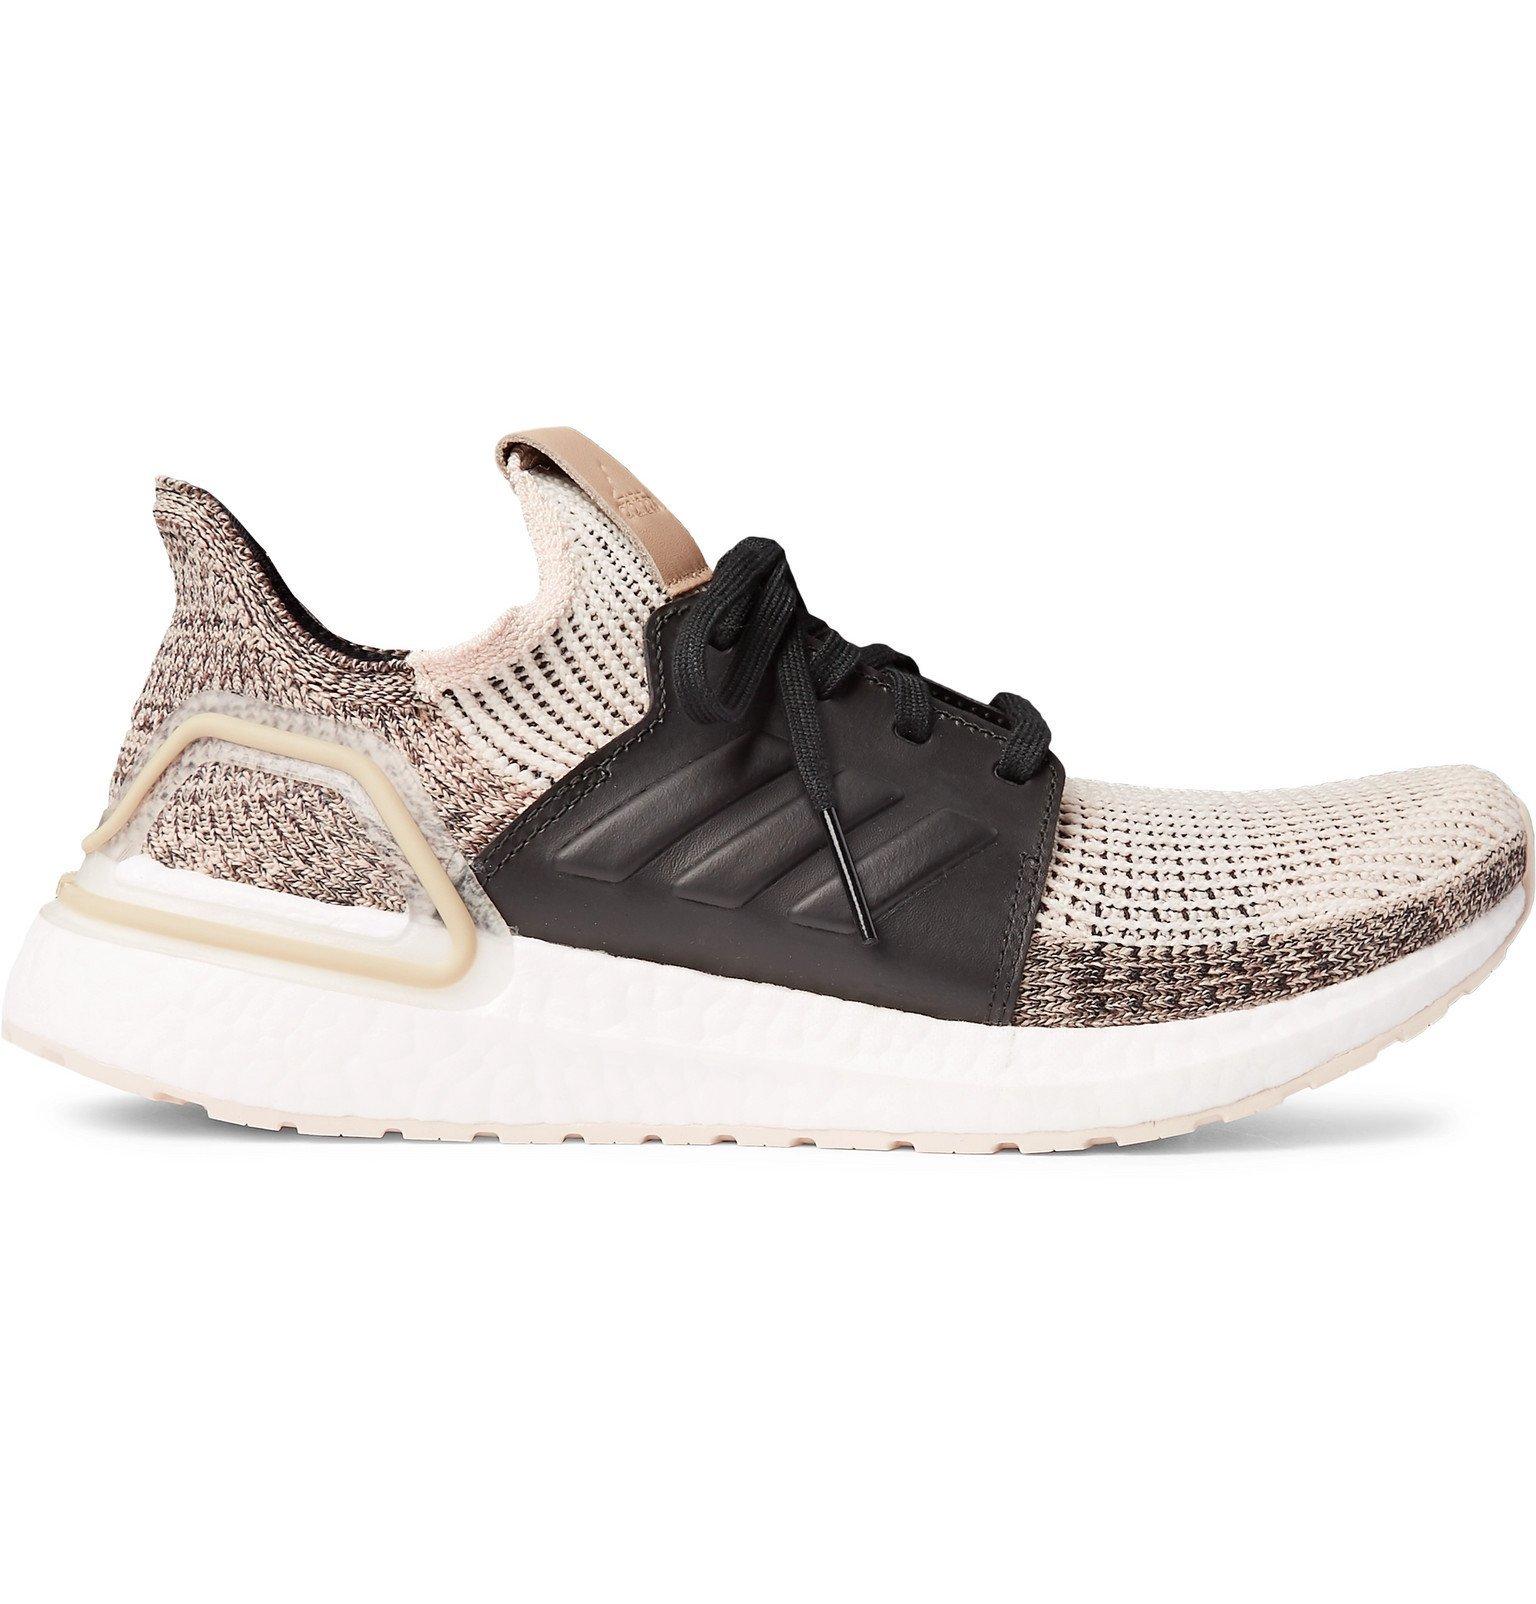 Photo: Adidas Sport - UltraBOOST 19 Rubber-Trimmed Primeknit Running Sneakers - Neutrals